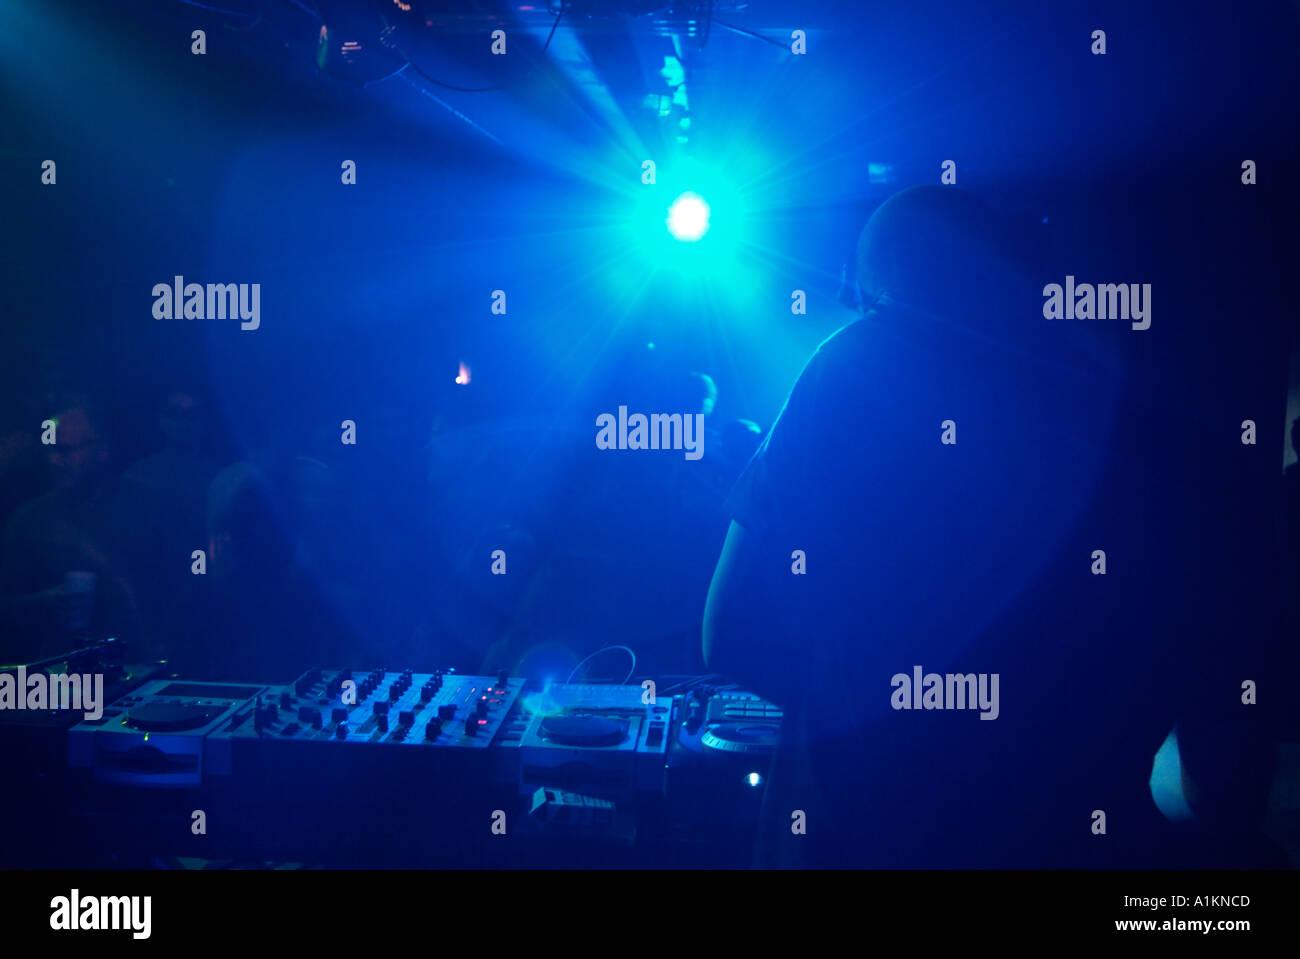 Club DJ Behind the Decks of a Crowded Nightclub. - Stock Image